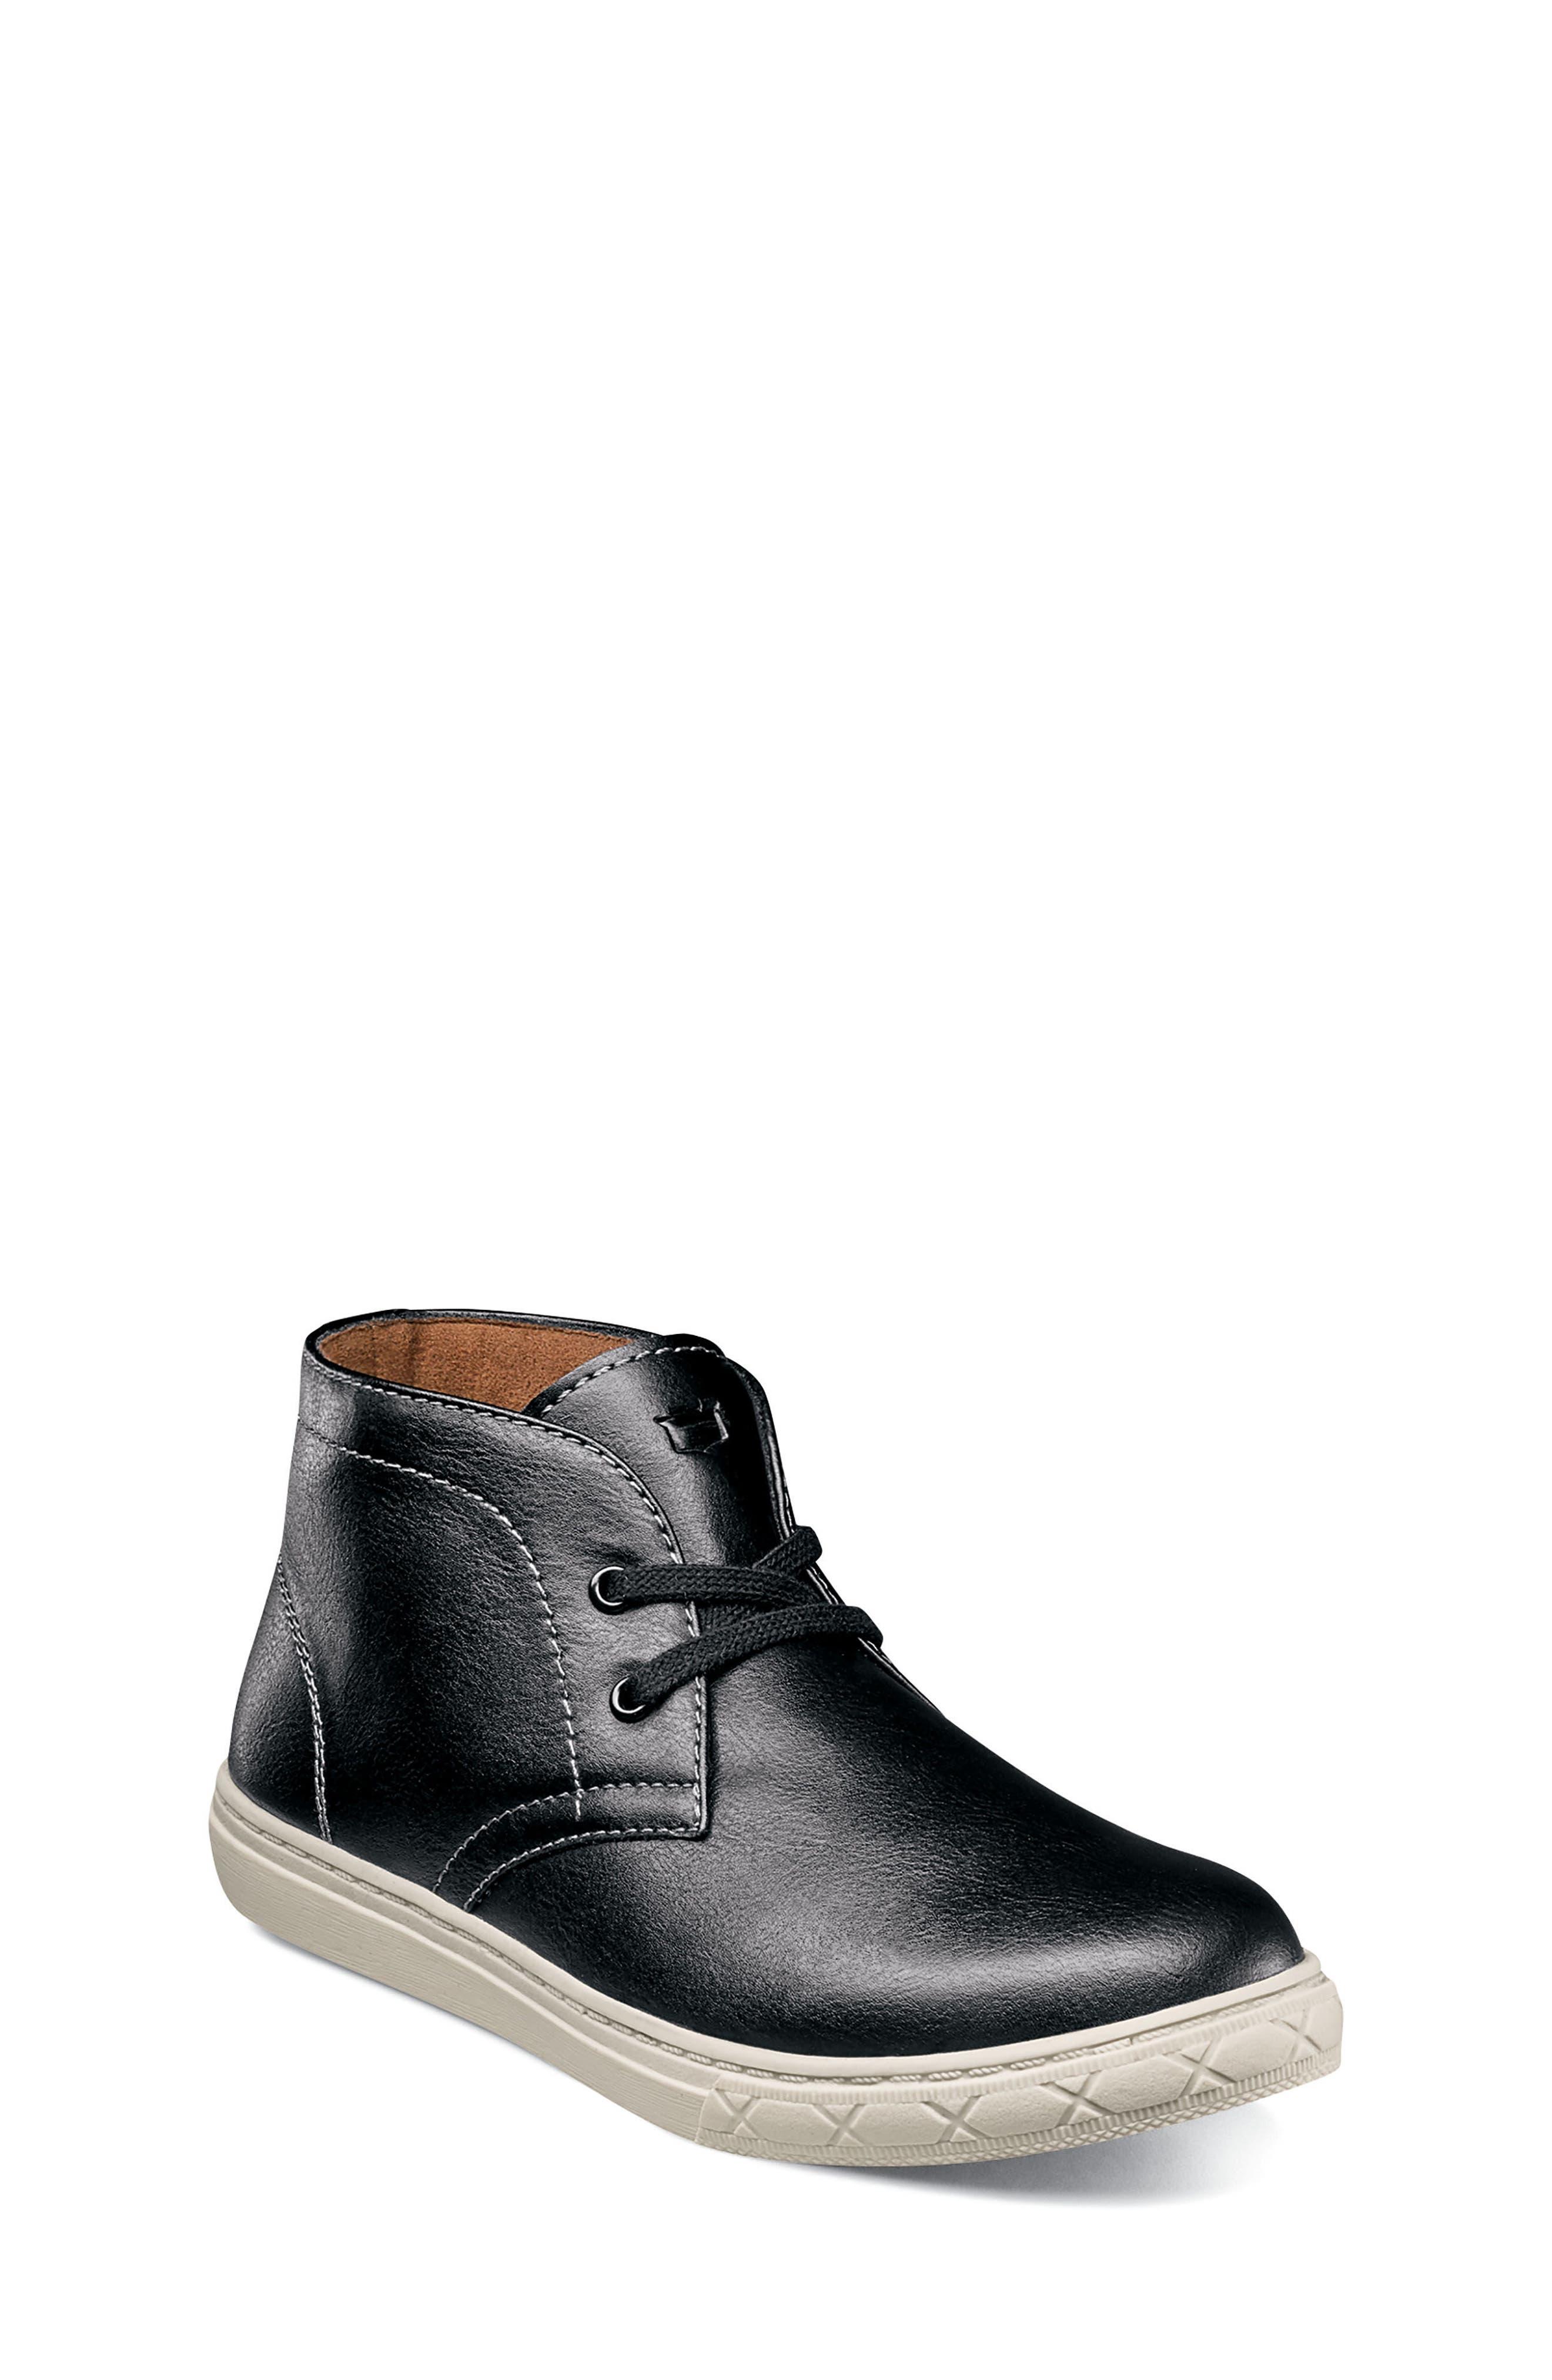 Curb Chukka Sneaker Boot,                         Main,                         color, Black